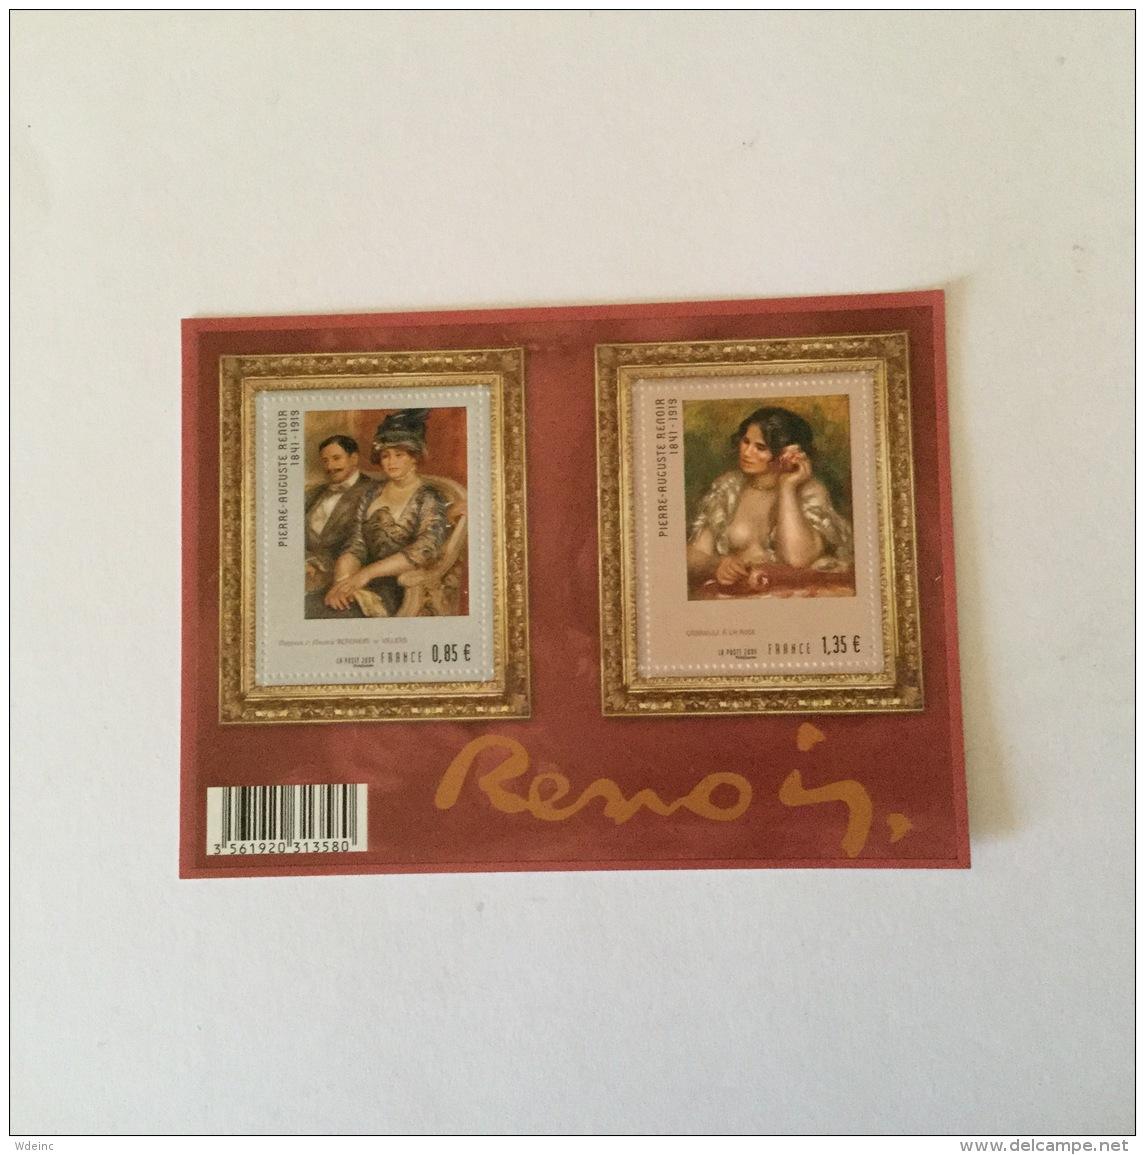 FRANCE 2009 Serie Artistique Pierre-Auguste Renoir Feuillet-M/S Superbe-MUH YvF4406 - France